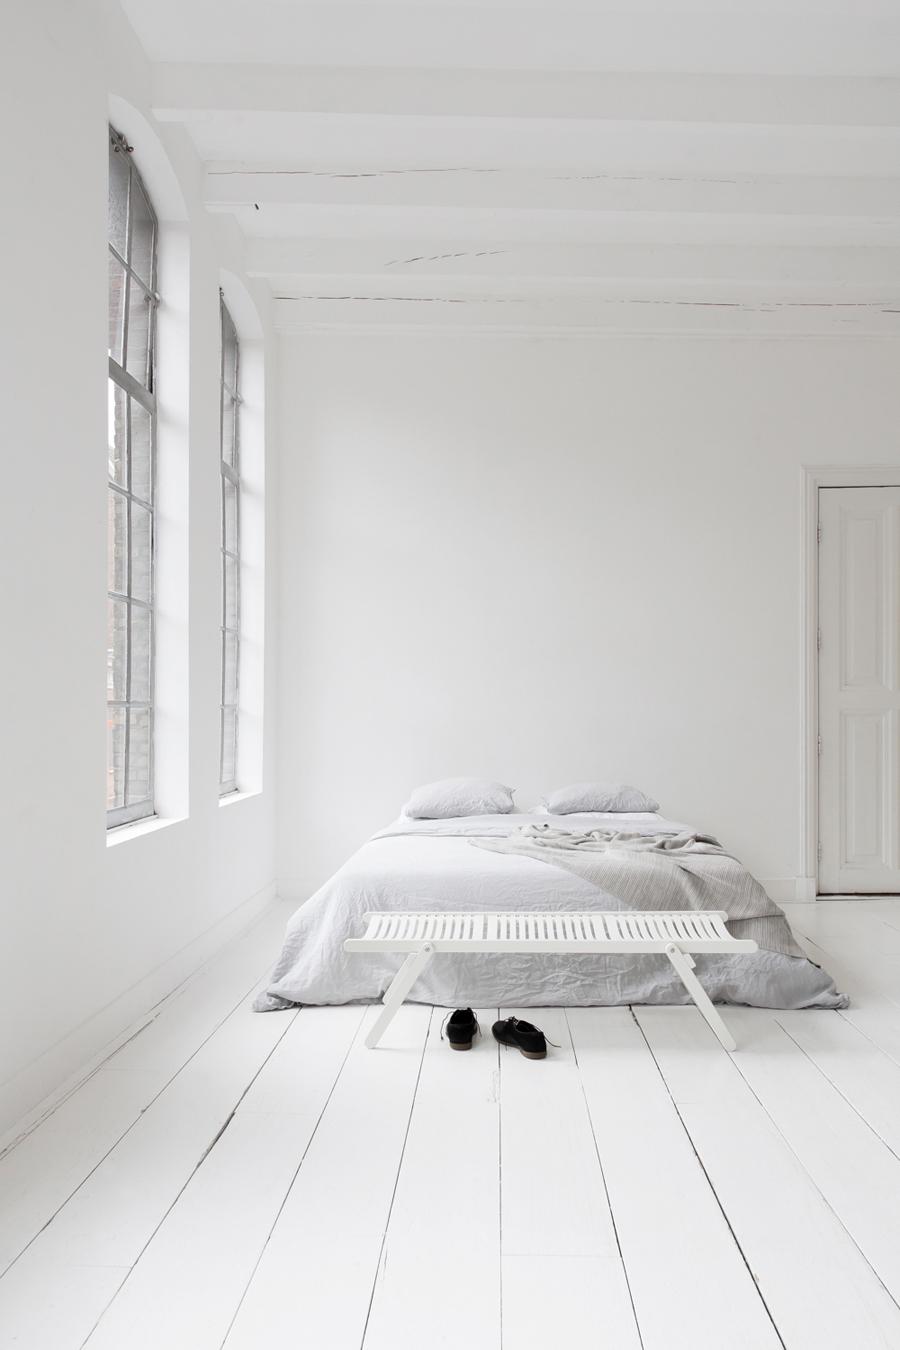 Rex Kralj - Daybed White - © Photography- beeldSTEIL